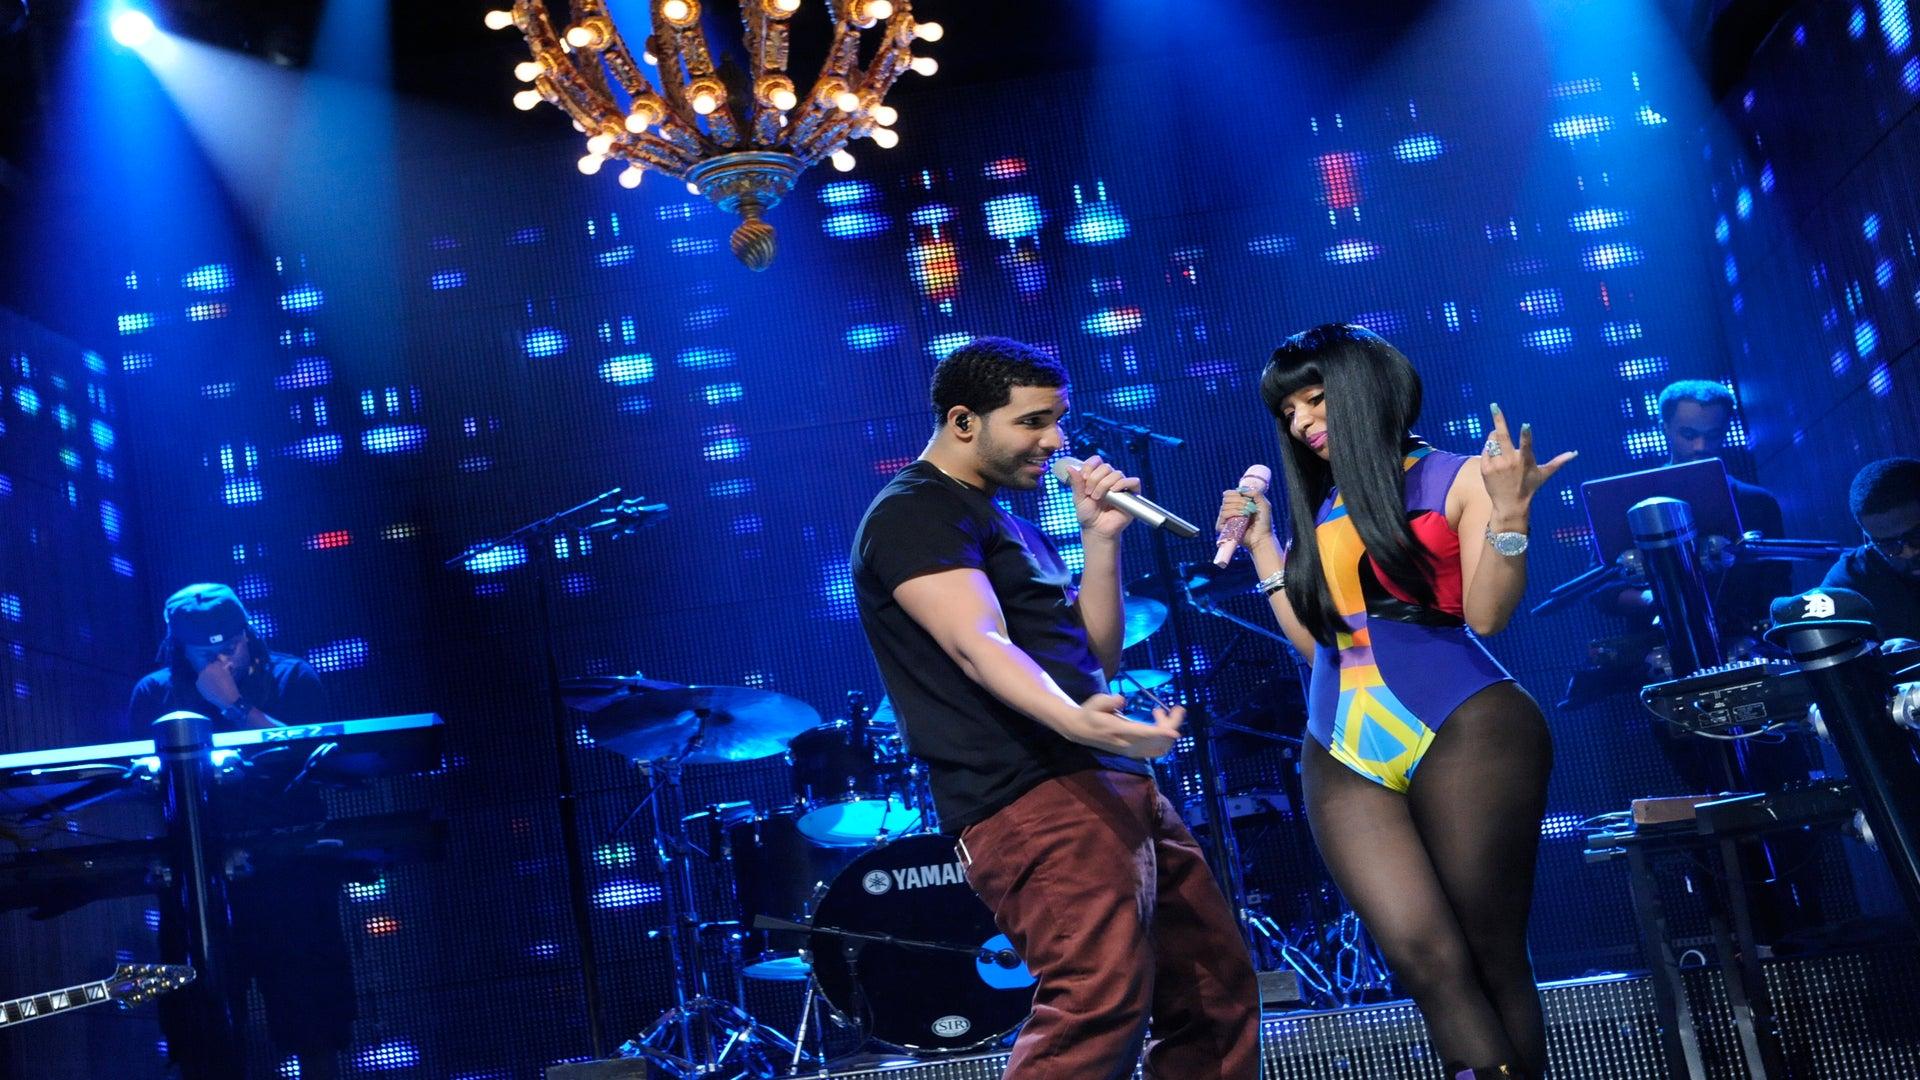 Drake Admits He and Nicki Minaj Don't Speak, But He's Still Got Love For Her